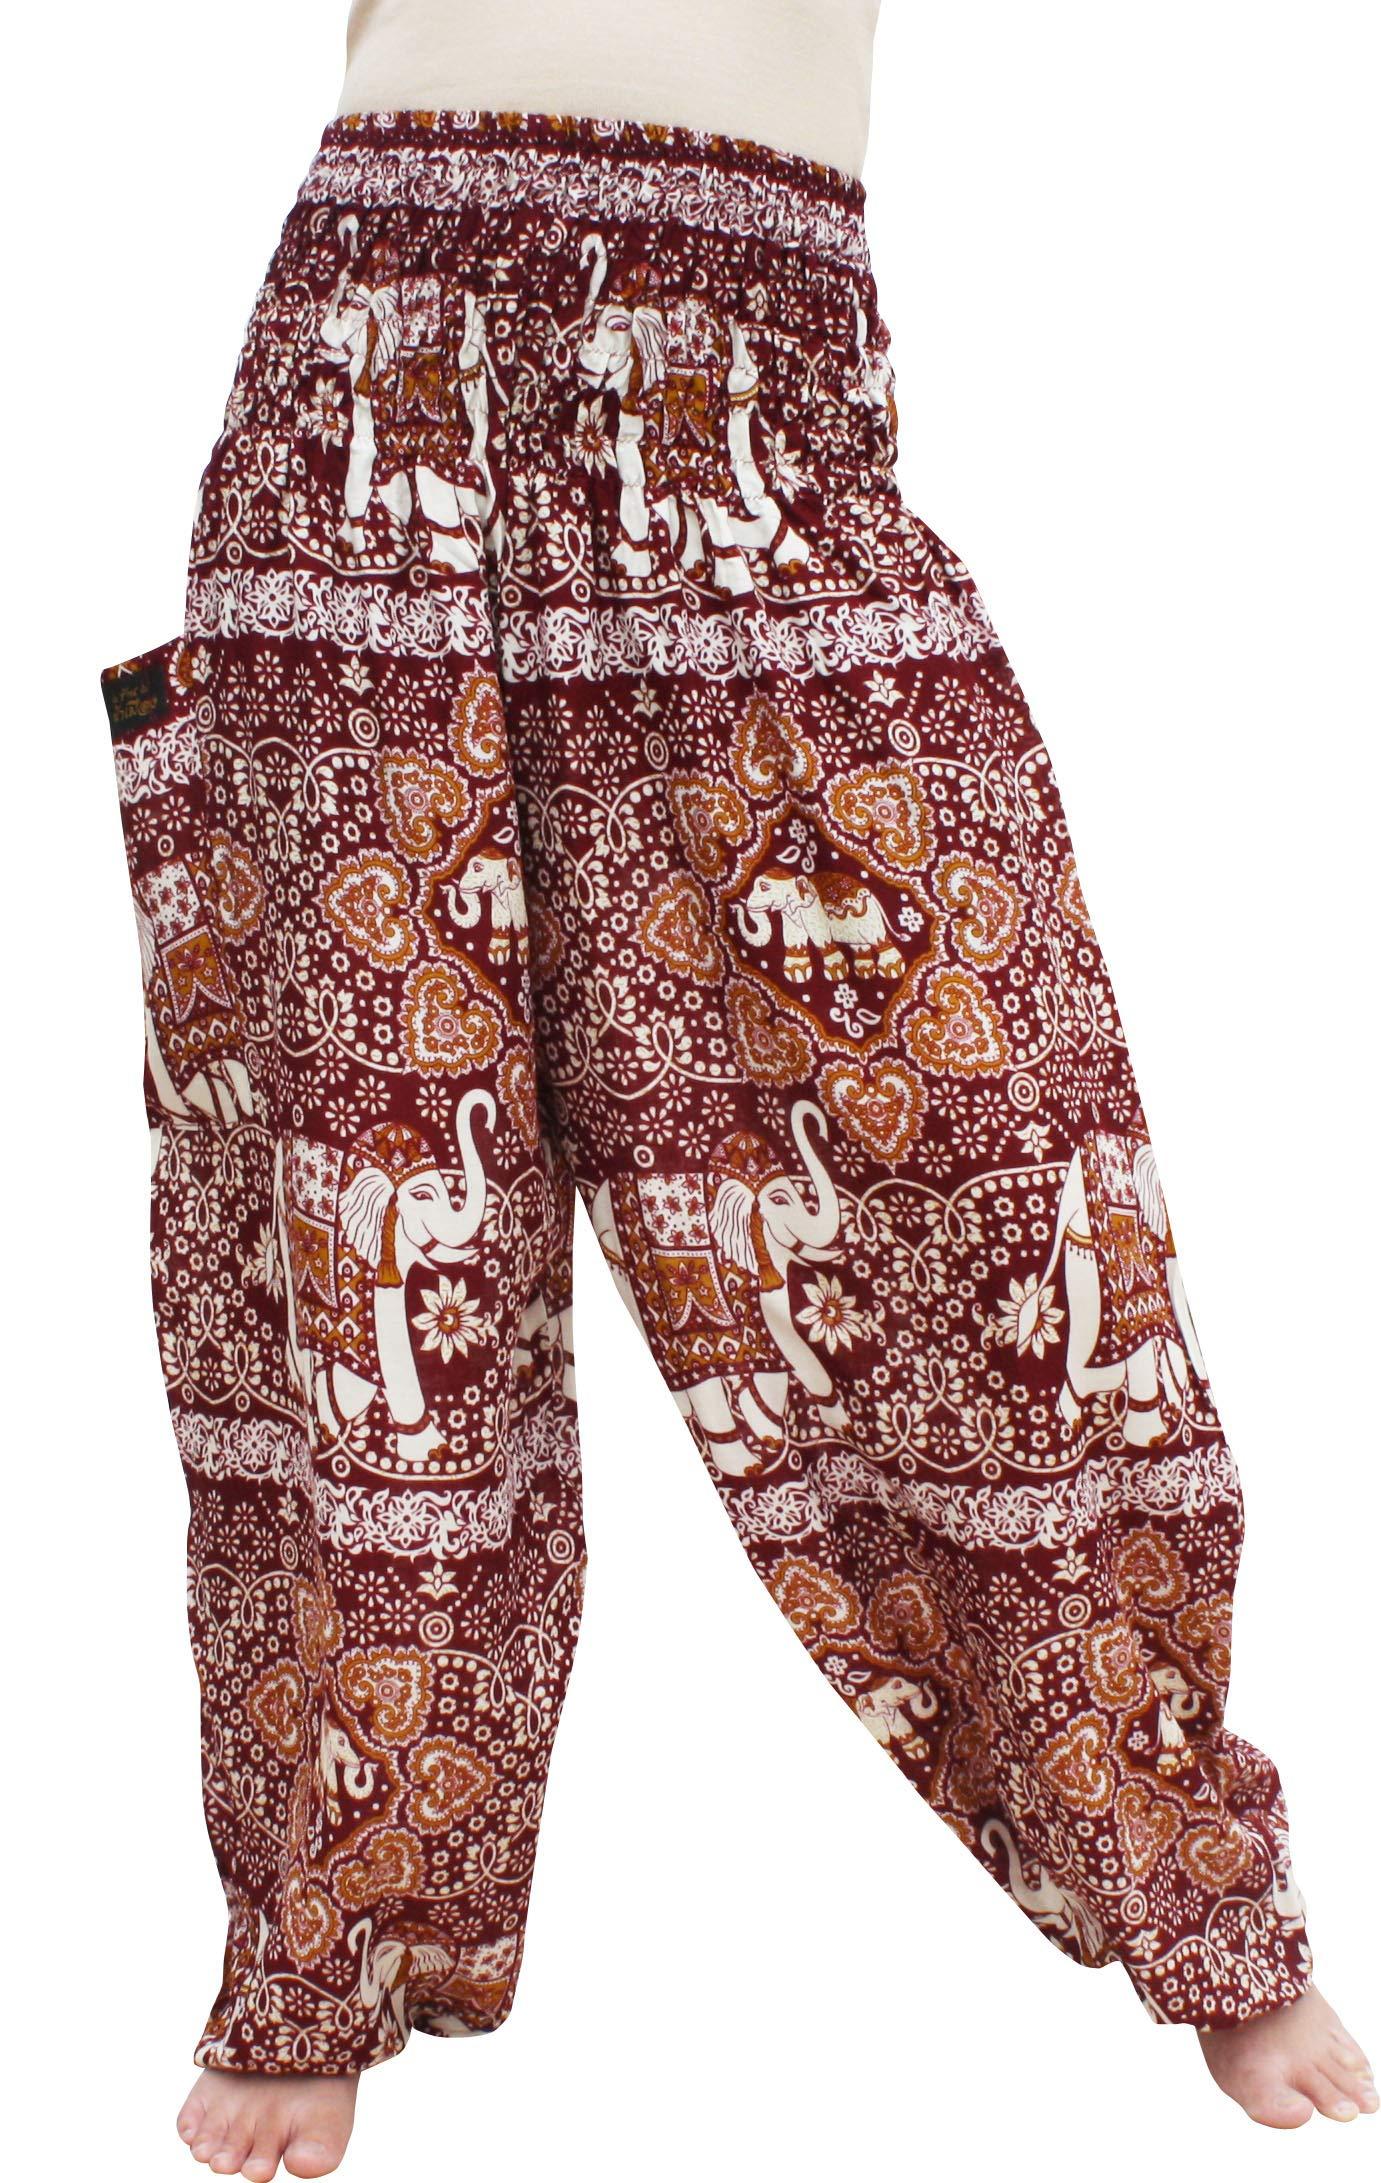 RaanPahMuang Brand Smock Waist Rayon Mixed Art Harem Baggy Aladdin Pants, Medium, Intricate Elephant - Dark Red by RaanPahMuang